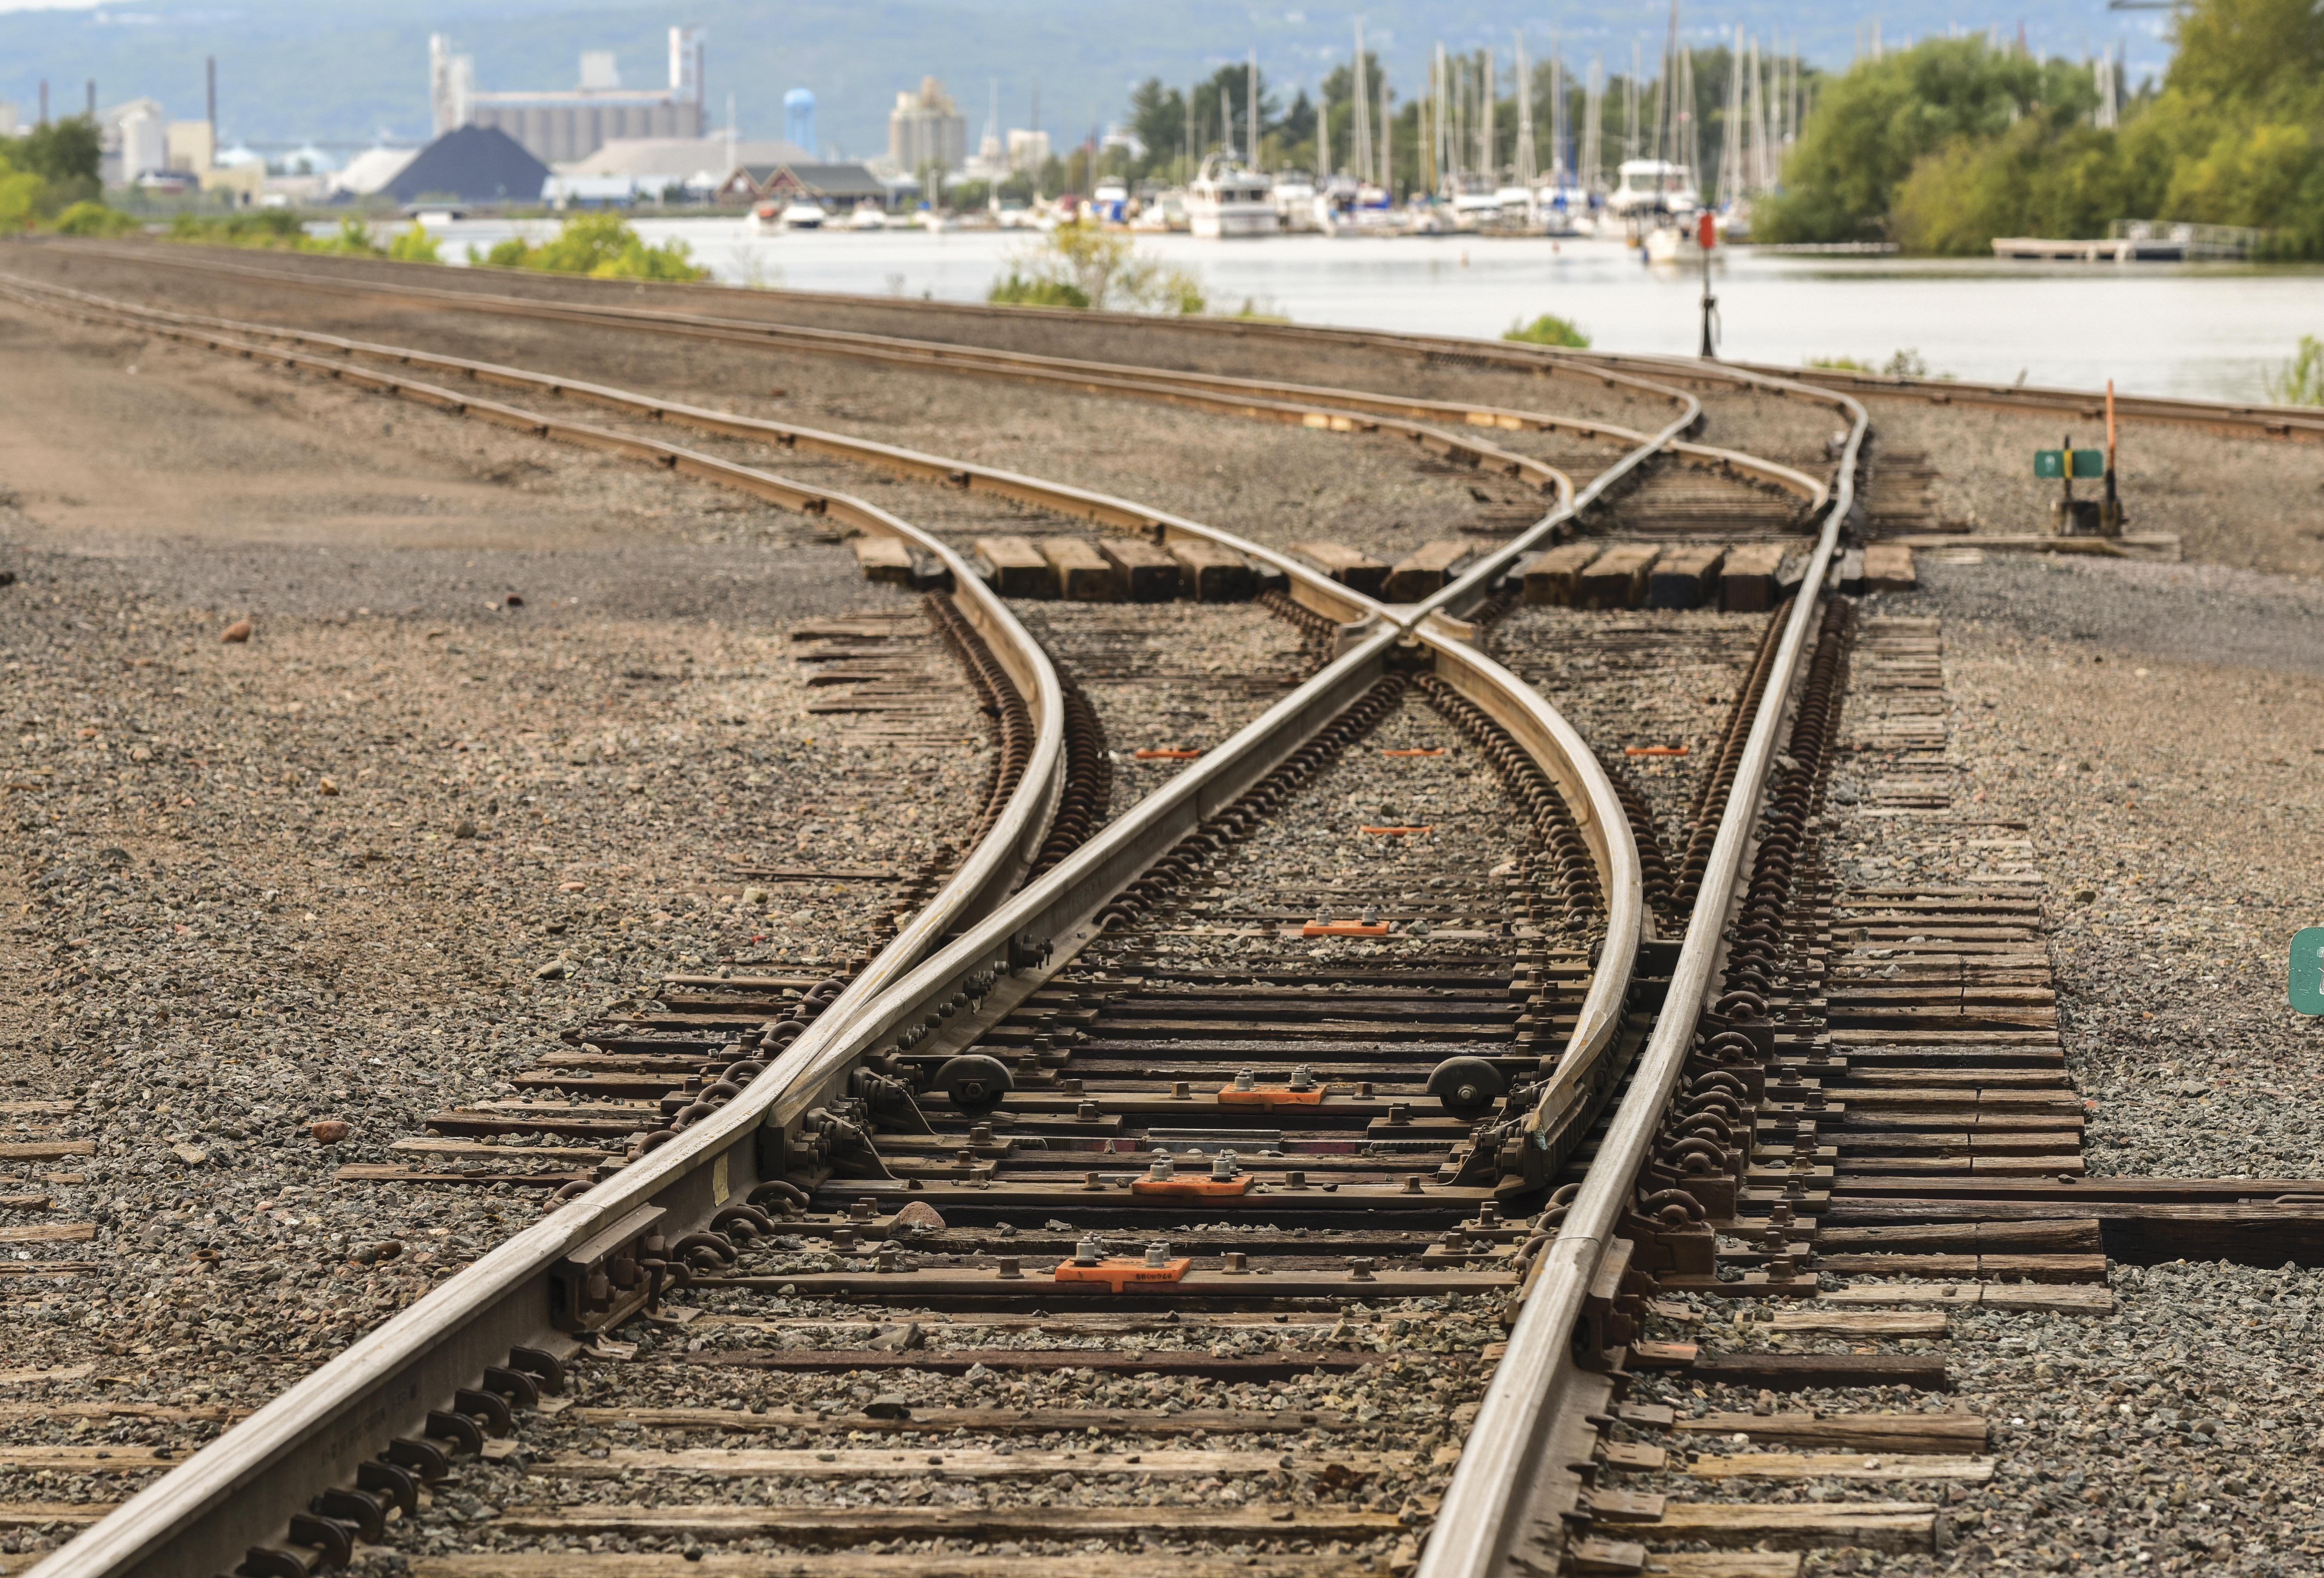 A switch in a railway line in a rail yard.